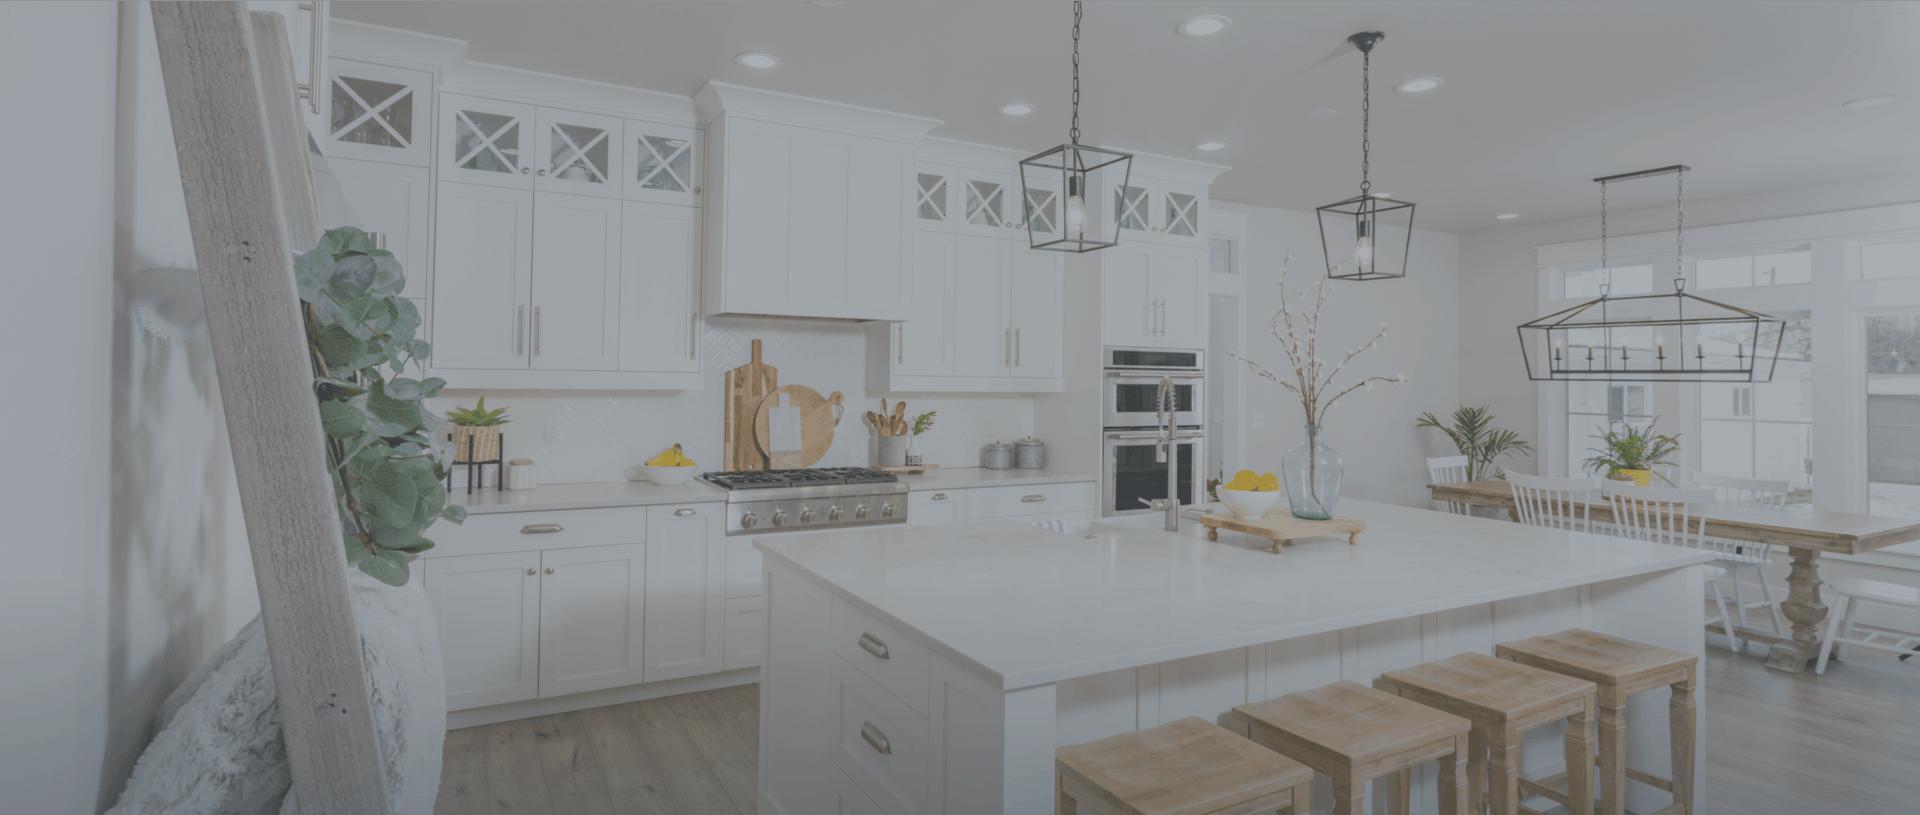 Interior photo of white kitchen with island